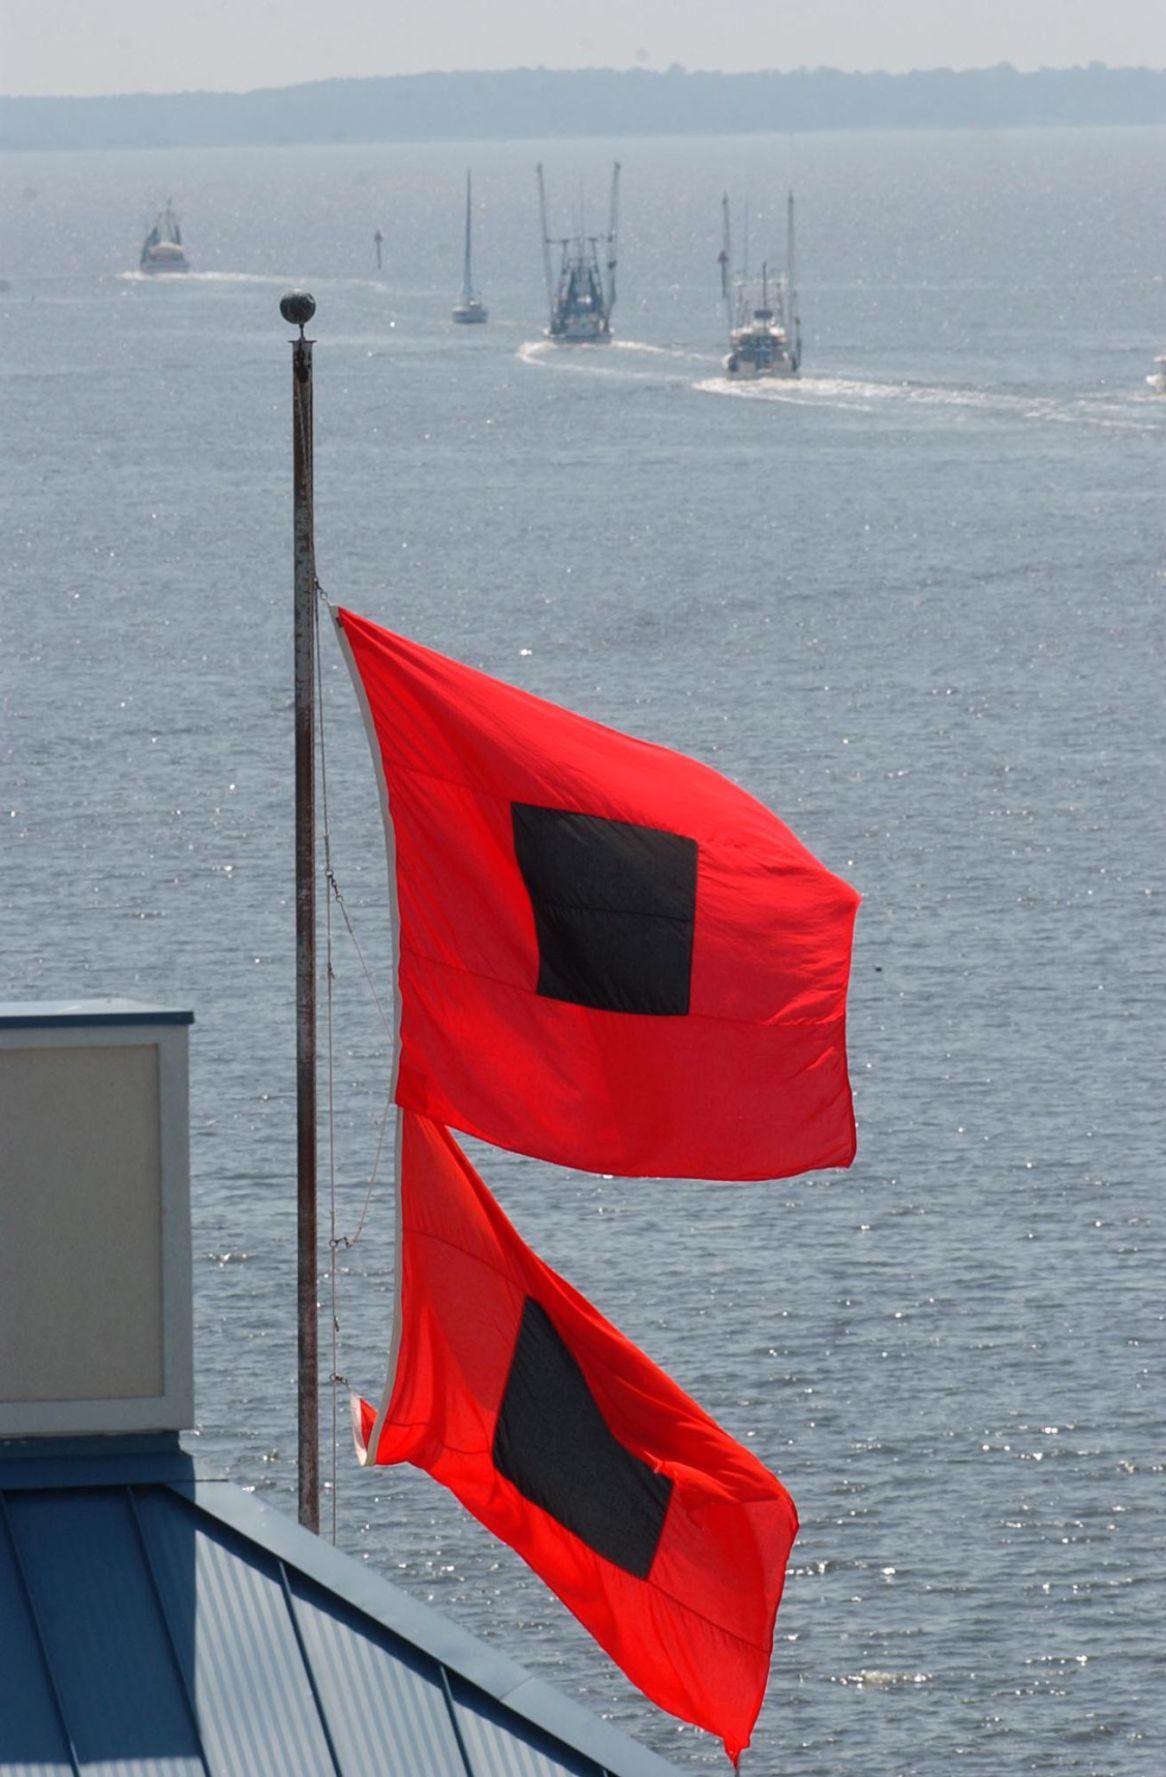 Hurricane warning flags